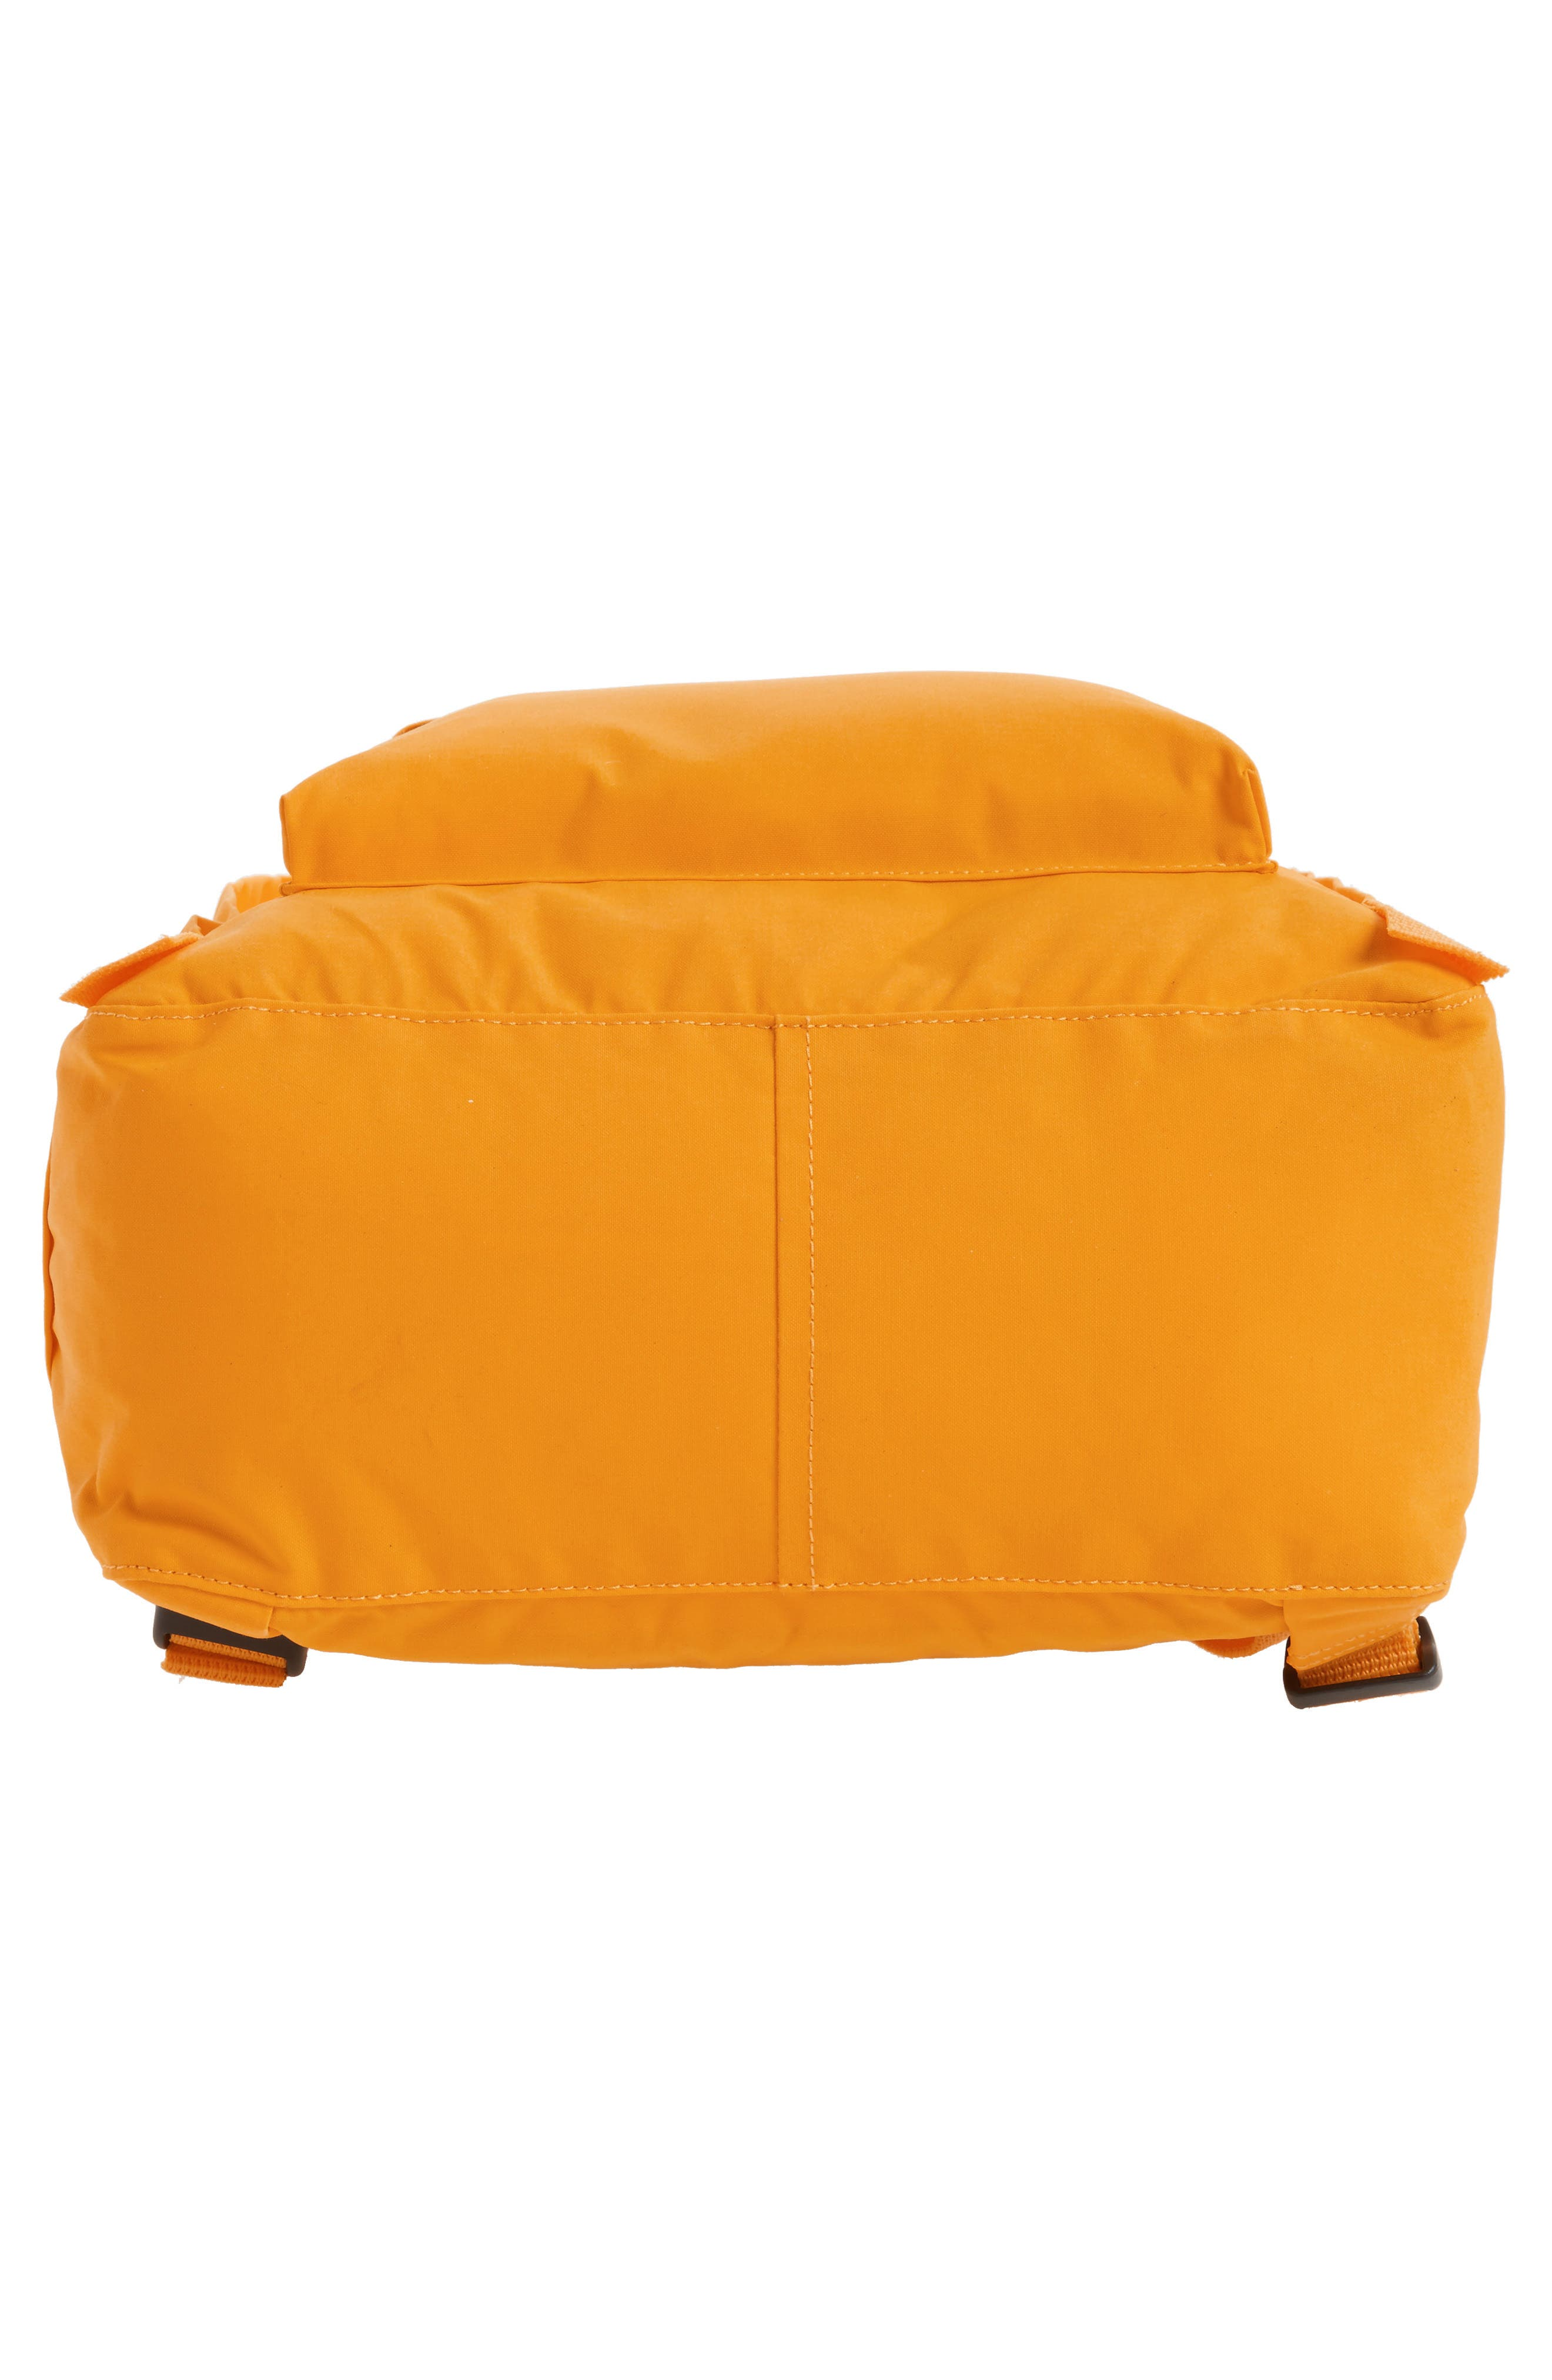 'Kånken' Water Resistant Backpack,                             Alternate thumbnail 362, color,